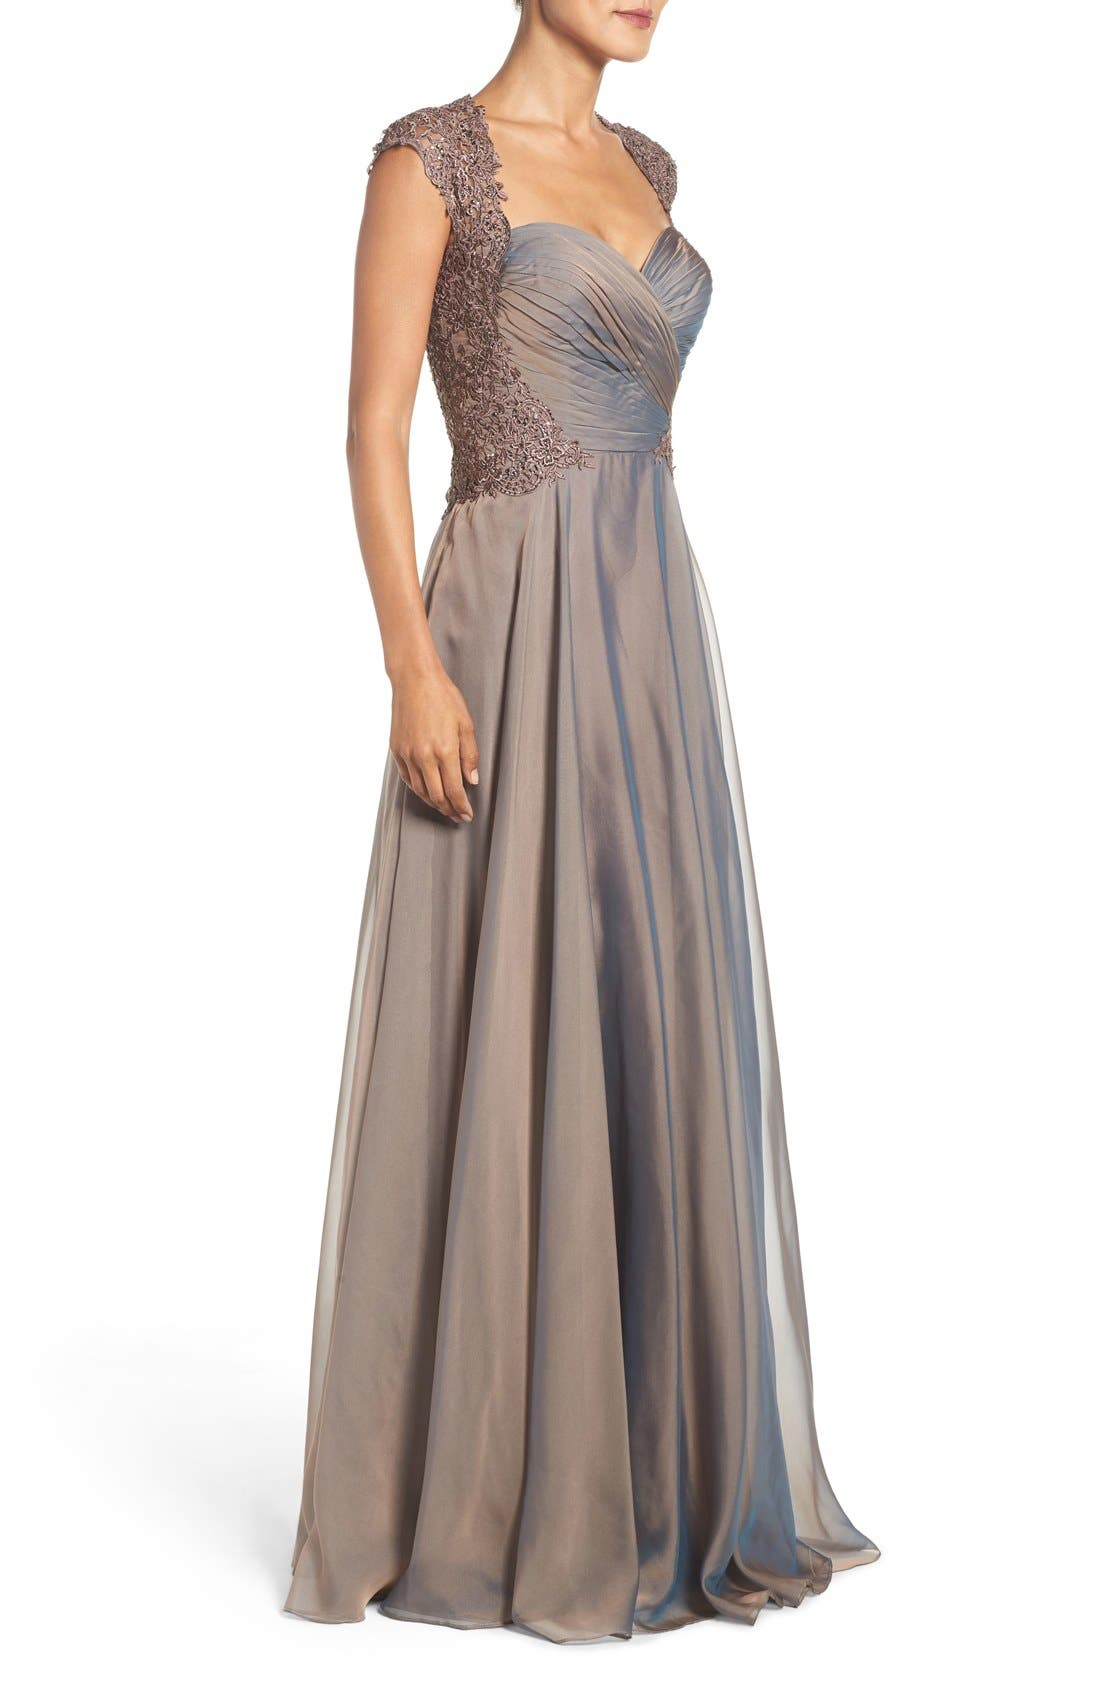 LA FEMME, Ruched Chiffon Gown, Alternate thumbnail 3, color, COCOA